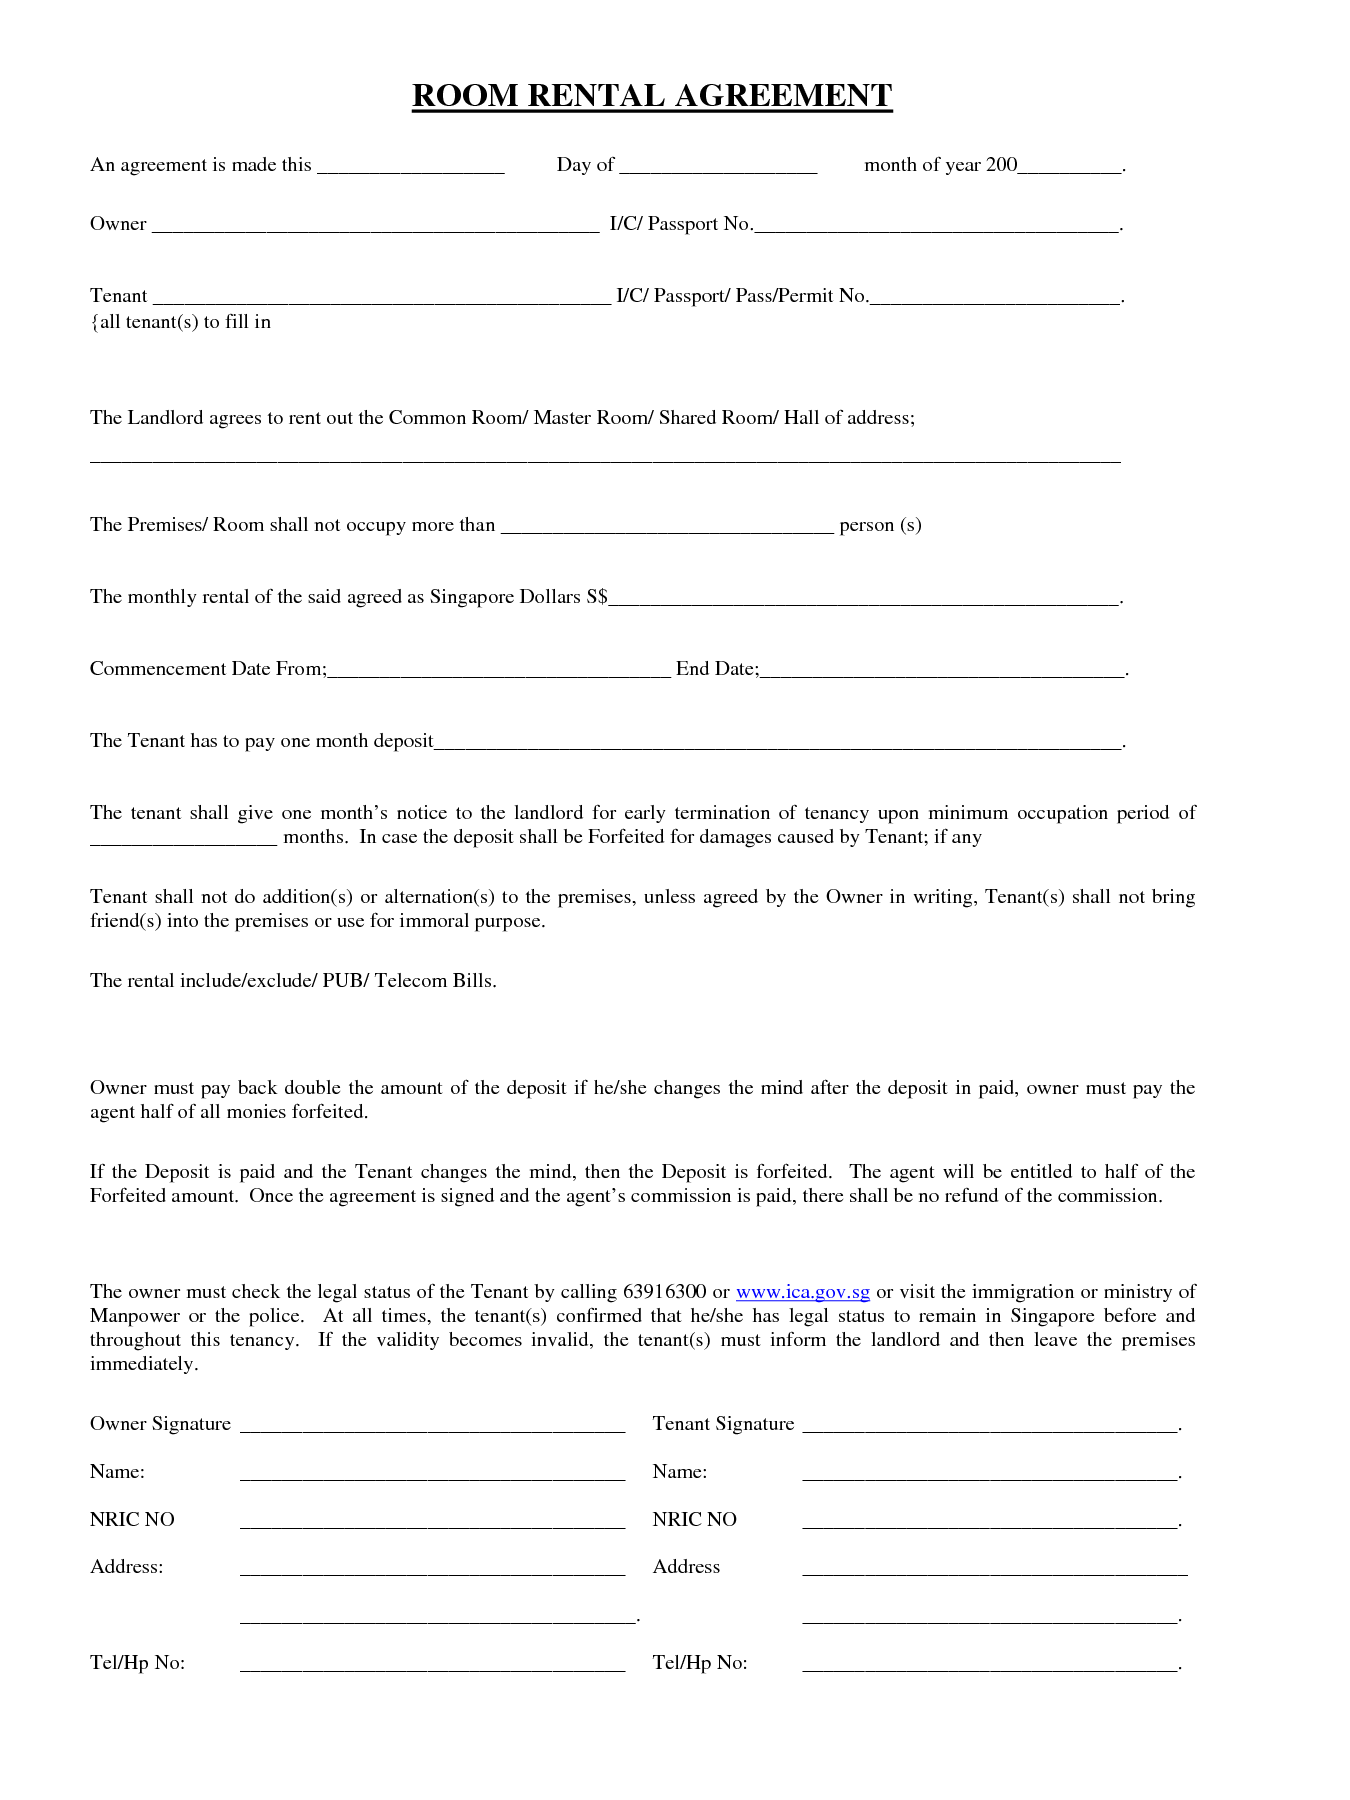 New Simple Rental Application Form Xls Xlsformat Xlstemplates Xlstemplate Room Rental Agreement Rental Agreement Templates Rental Application